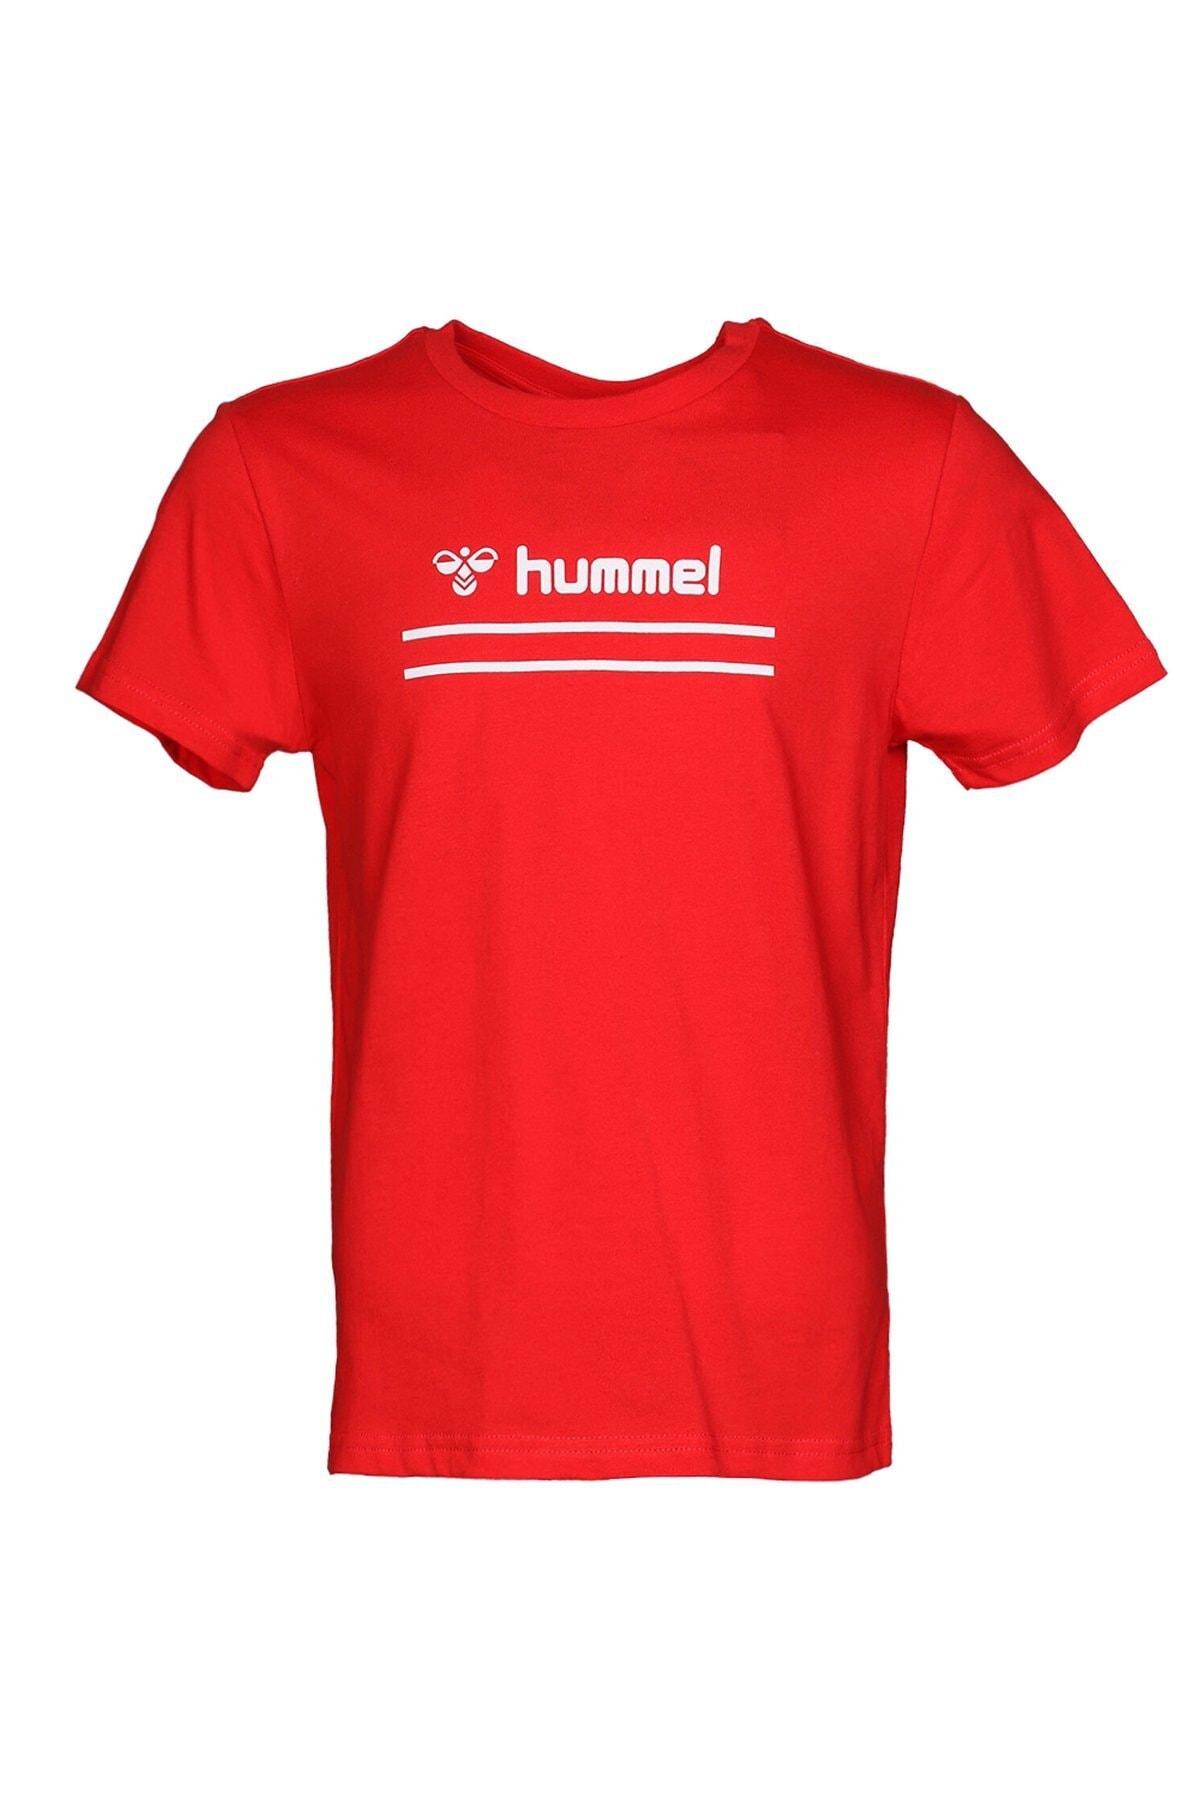 HUMMEL Kız Çocuk Kırmızı Kısa Kollu T-Shirt 2